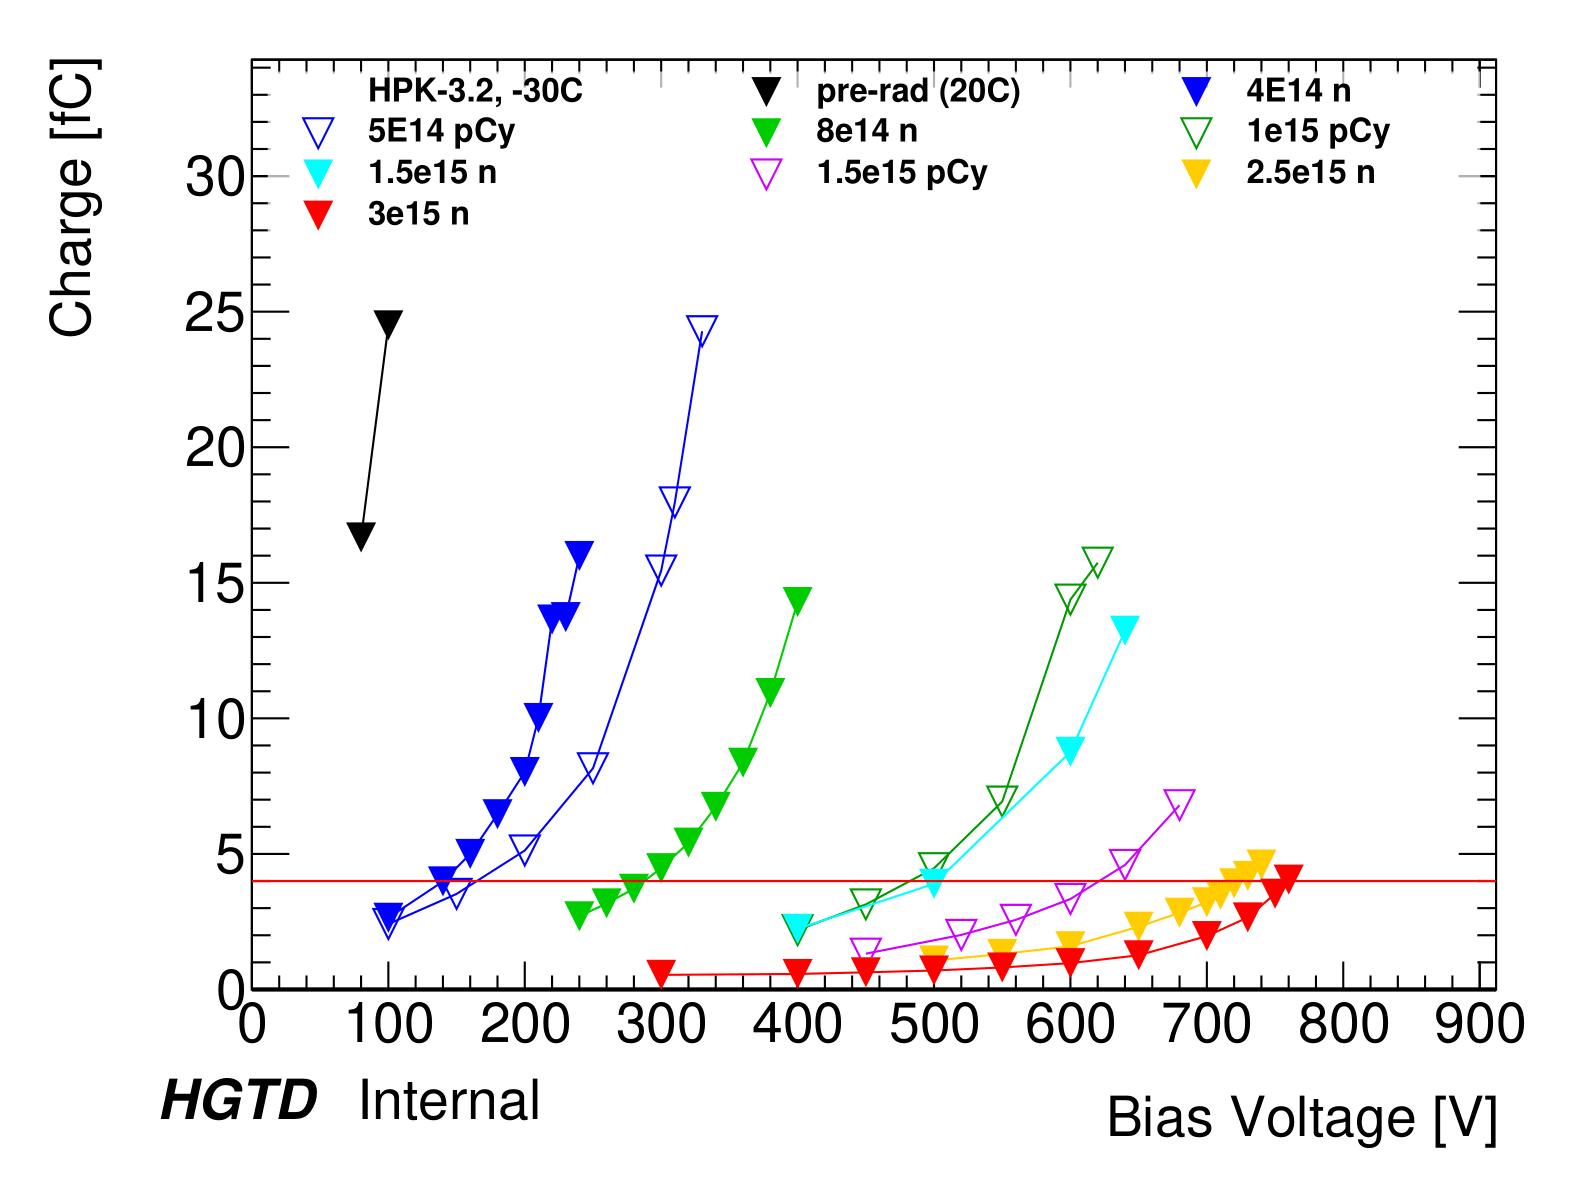 Plot_HPK32_bias_voltage_vs_charge-1.png